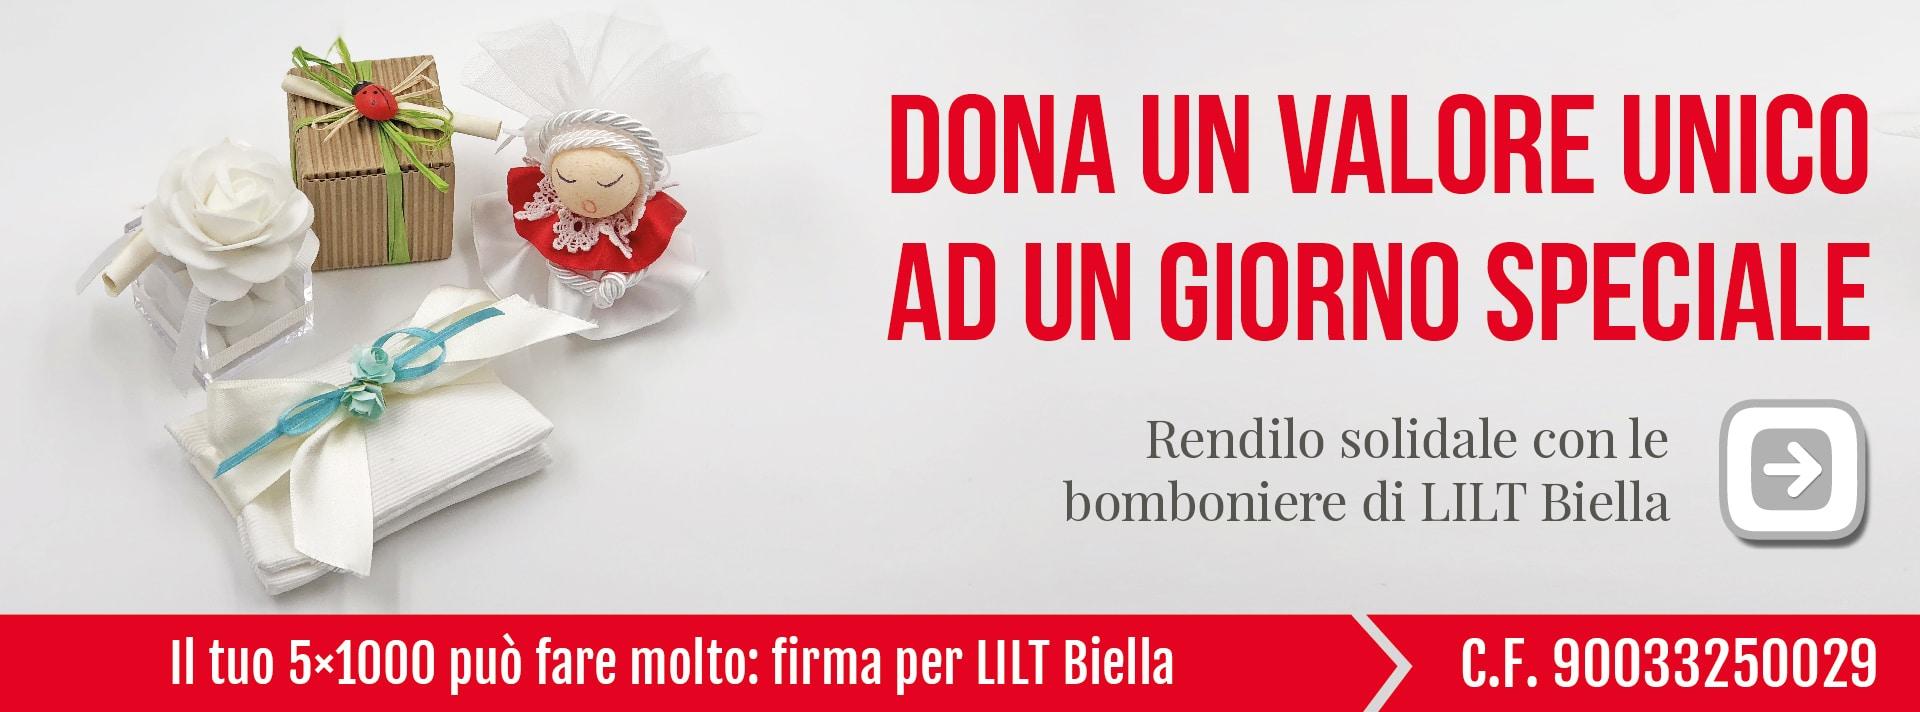 Bomboniere solidali LILT Biella